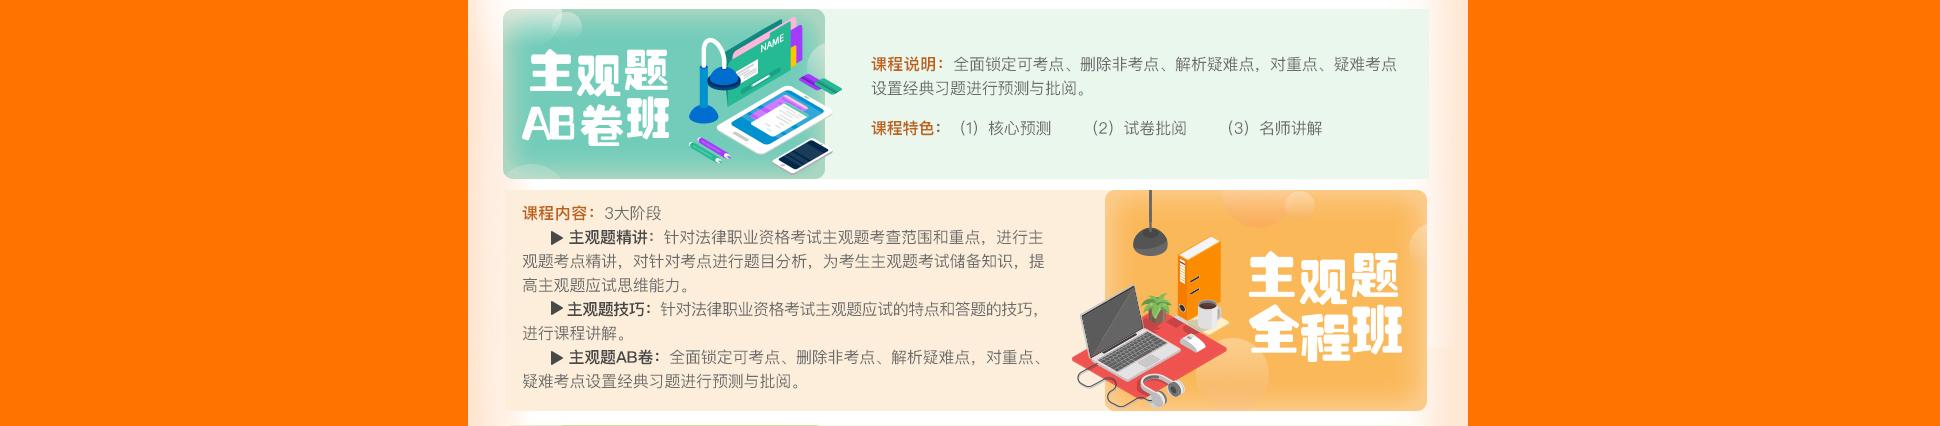 PC页面:2018年主观题教学计划-1940x_08.jpg